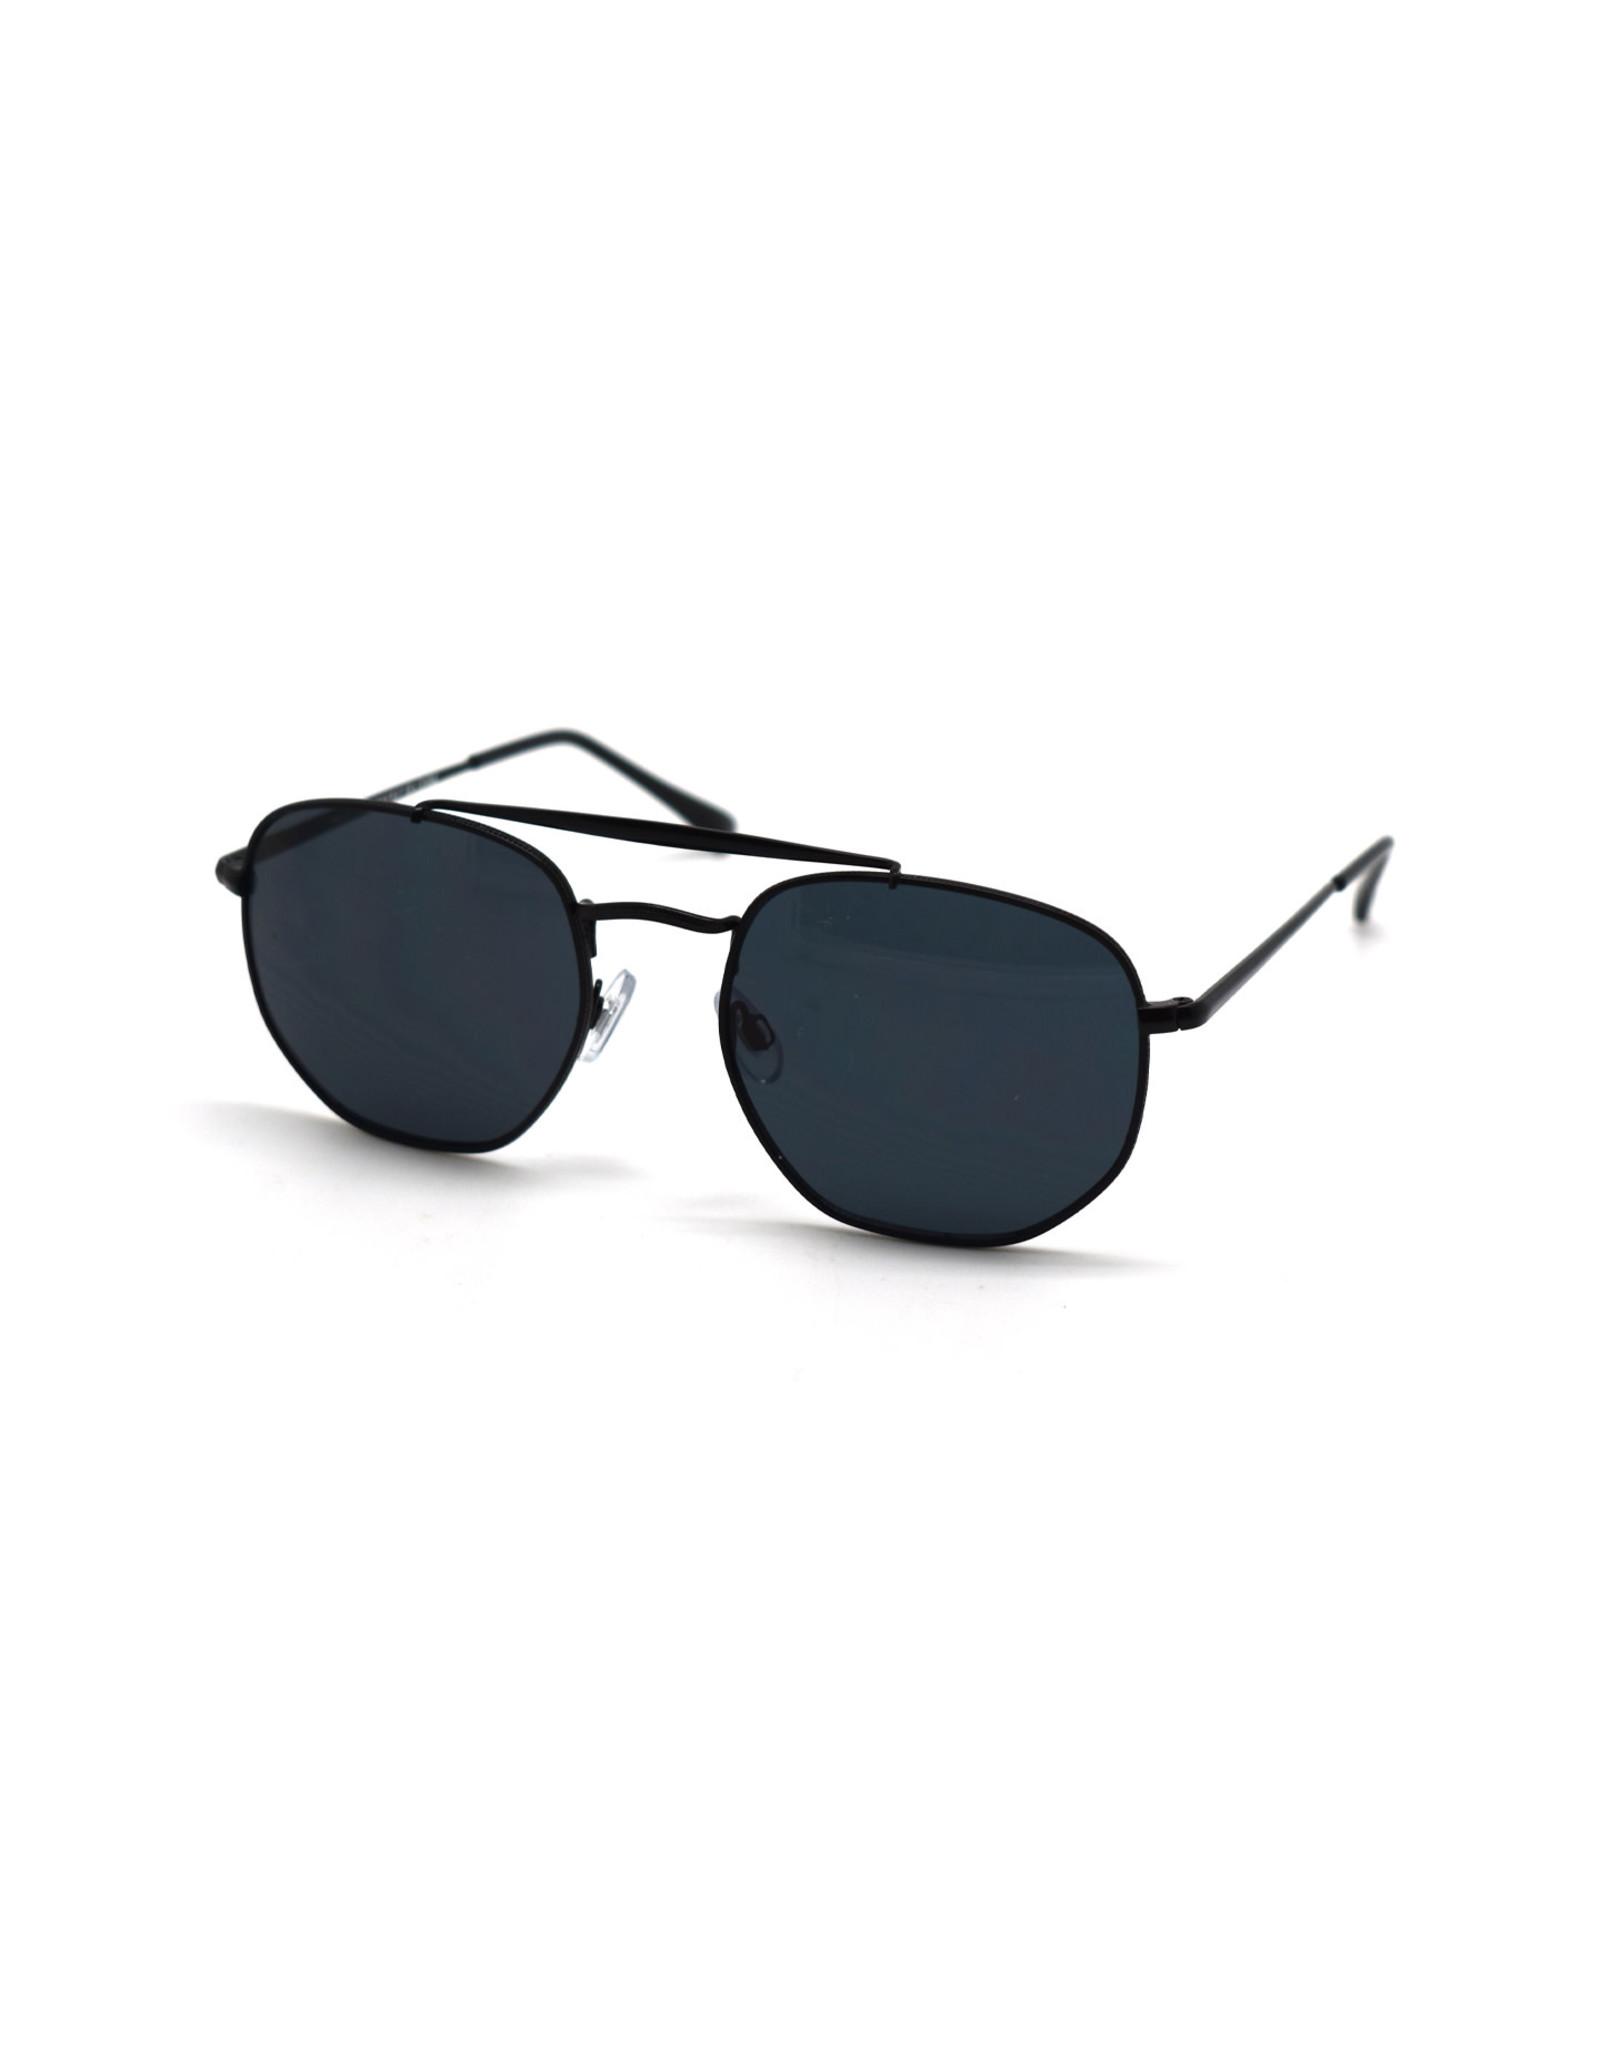 Everglade Sunglasses